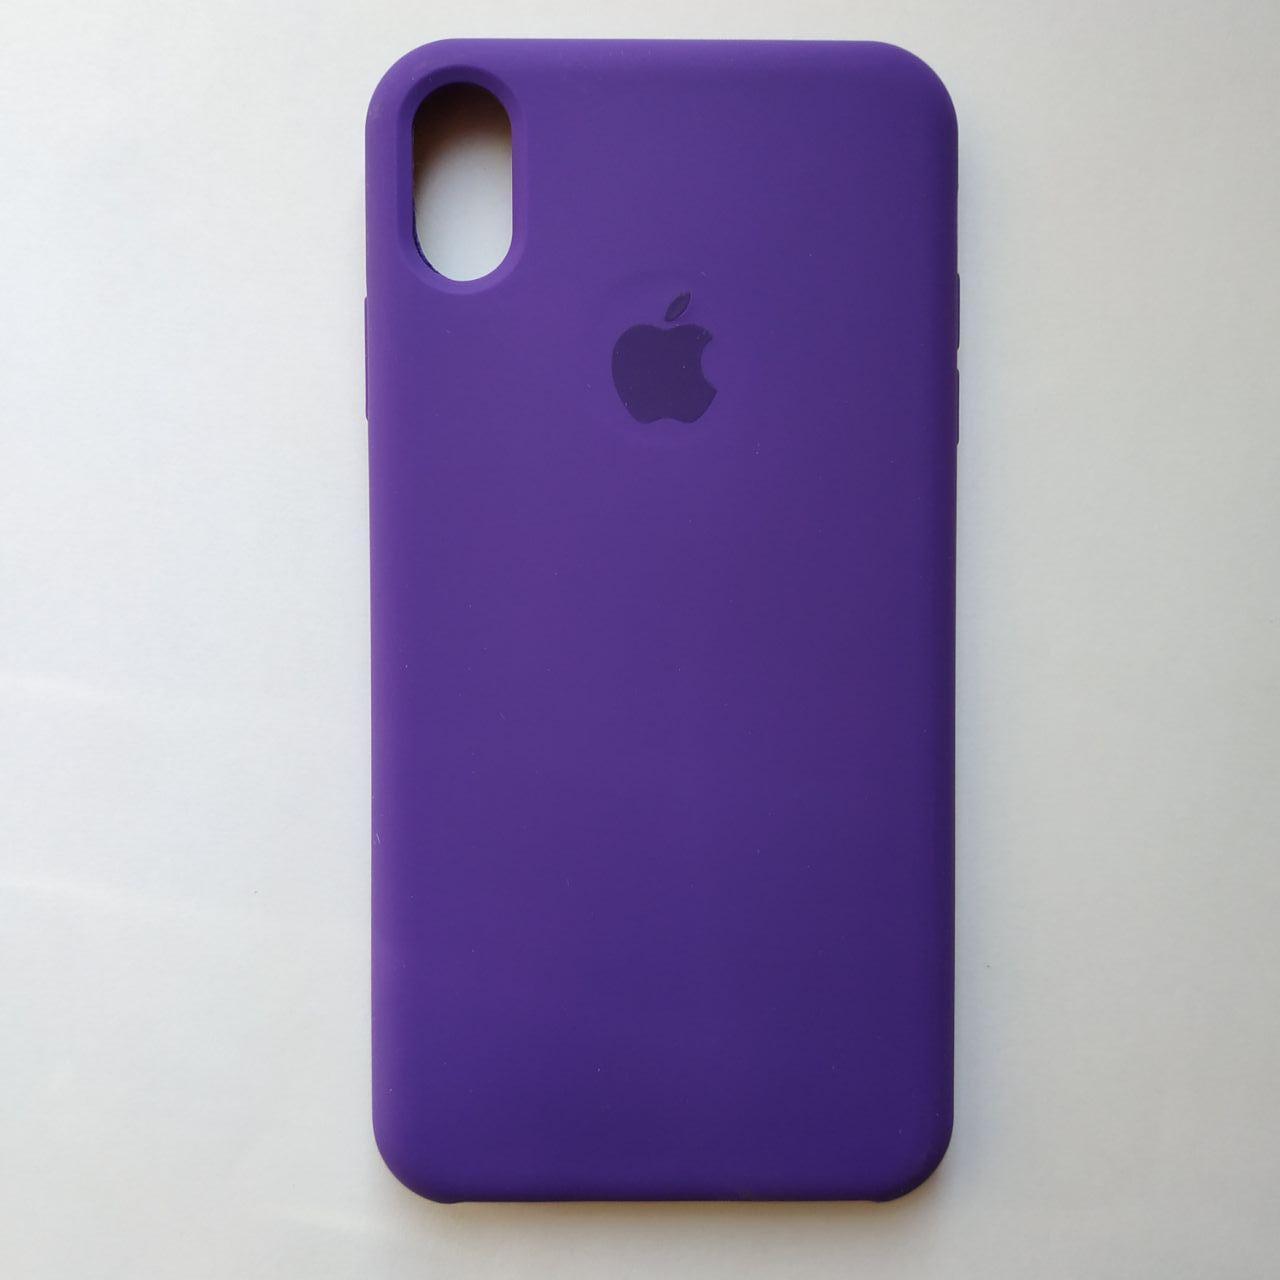 Чехол Silicone Case для Apple iPhone XS Max Ultra Violet